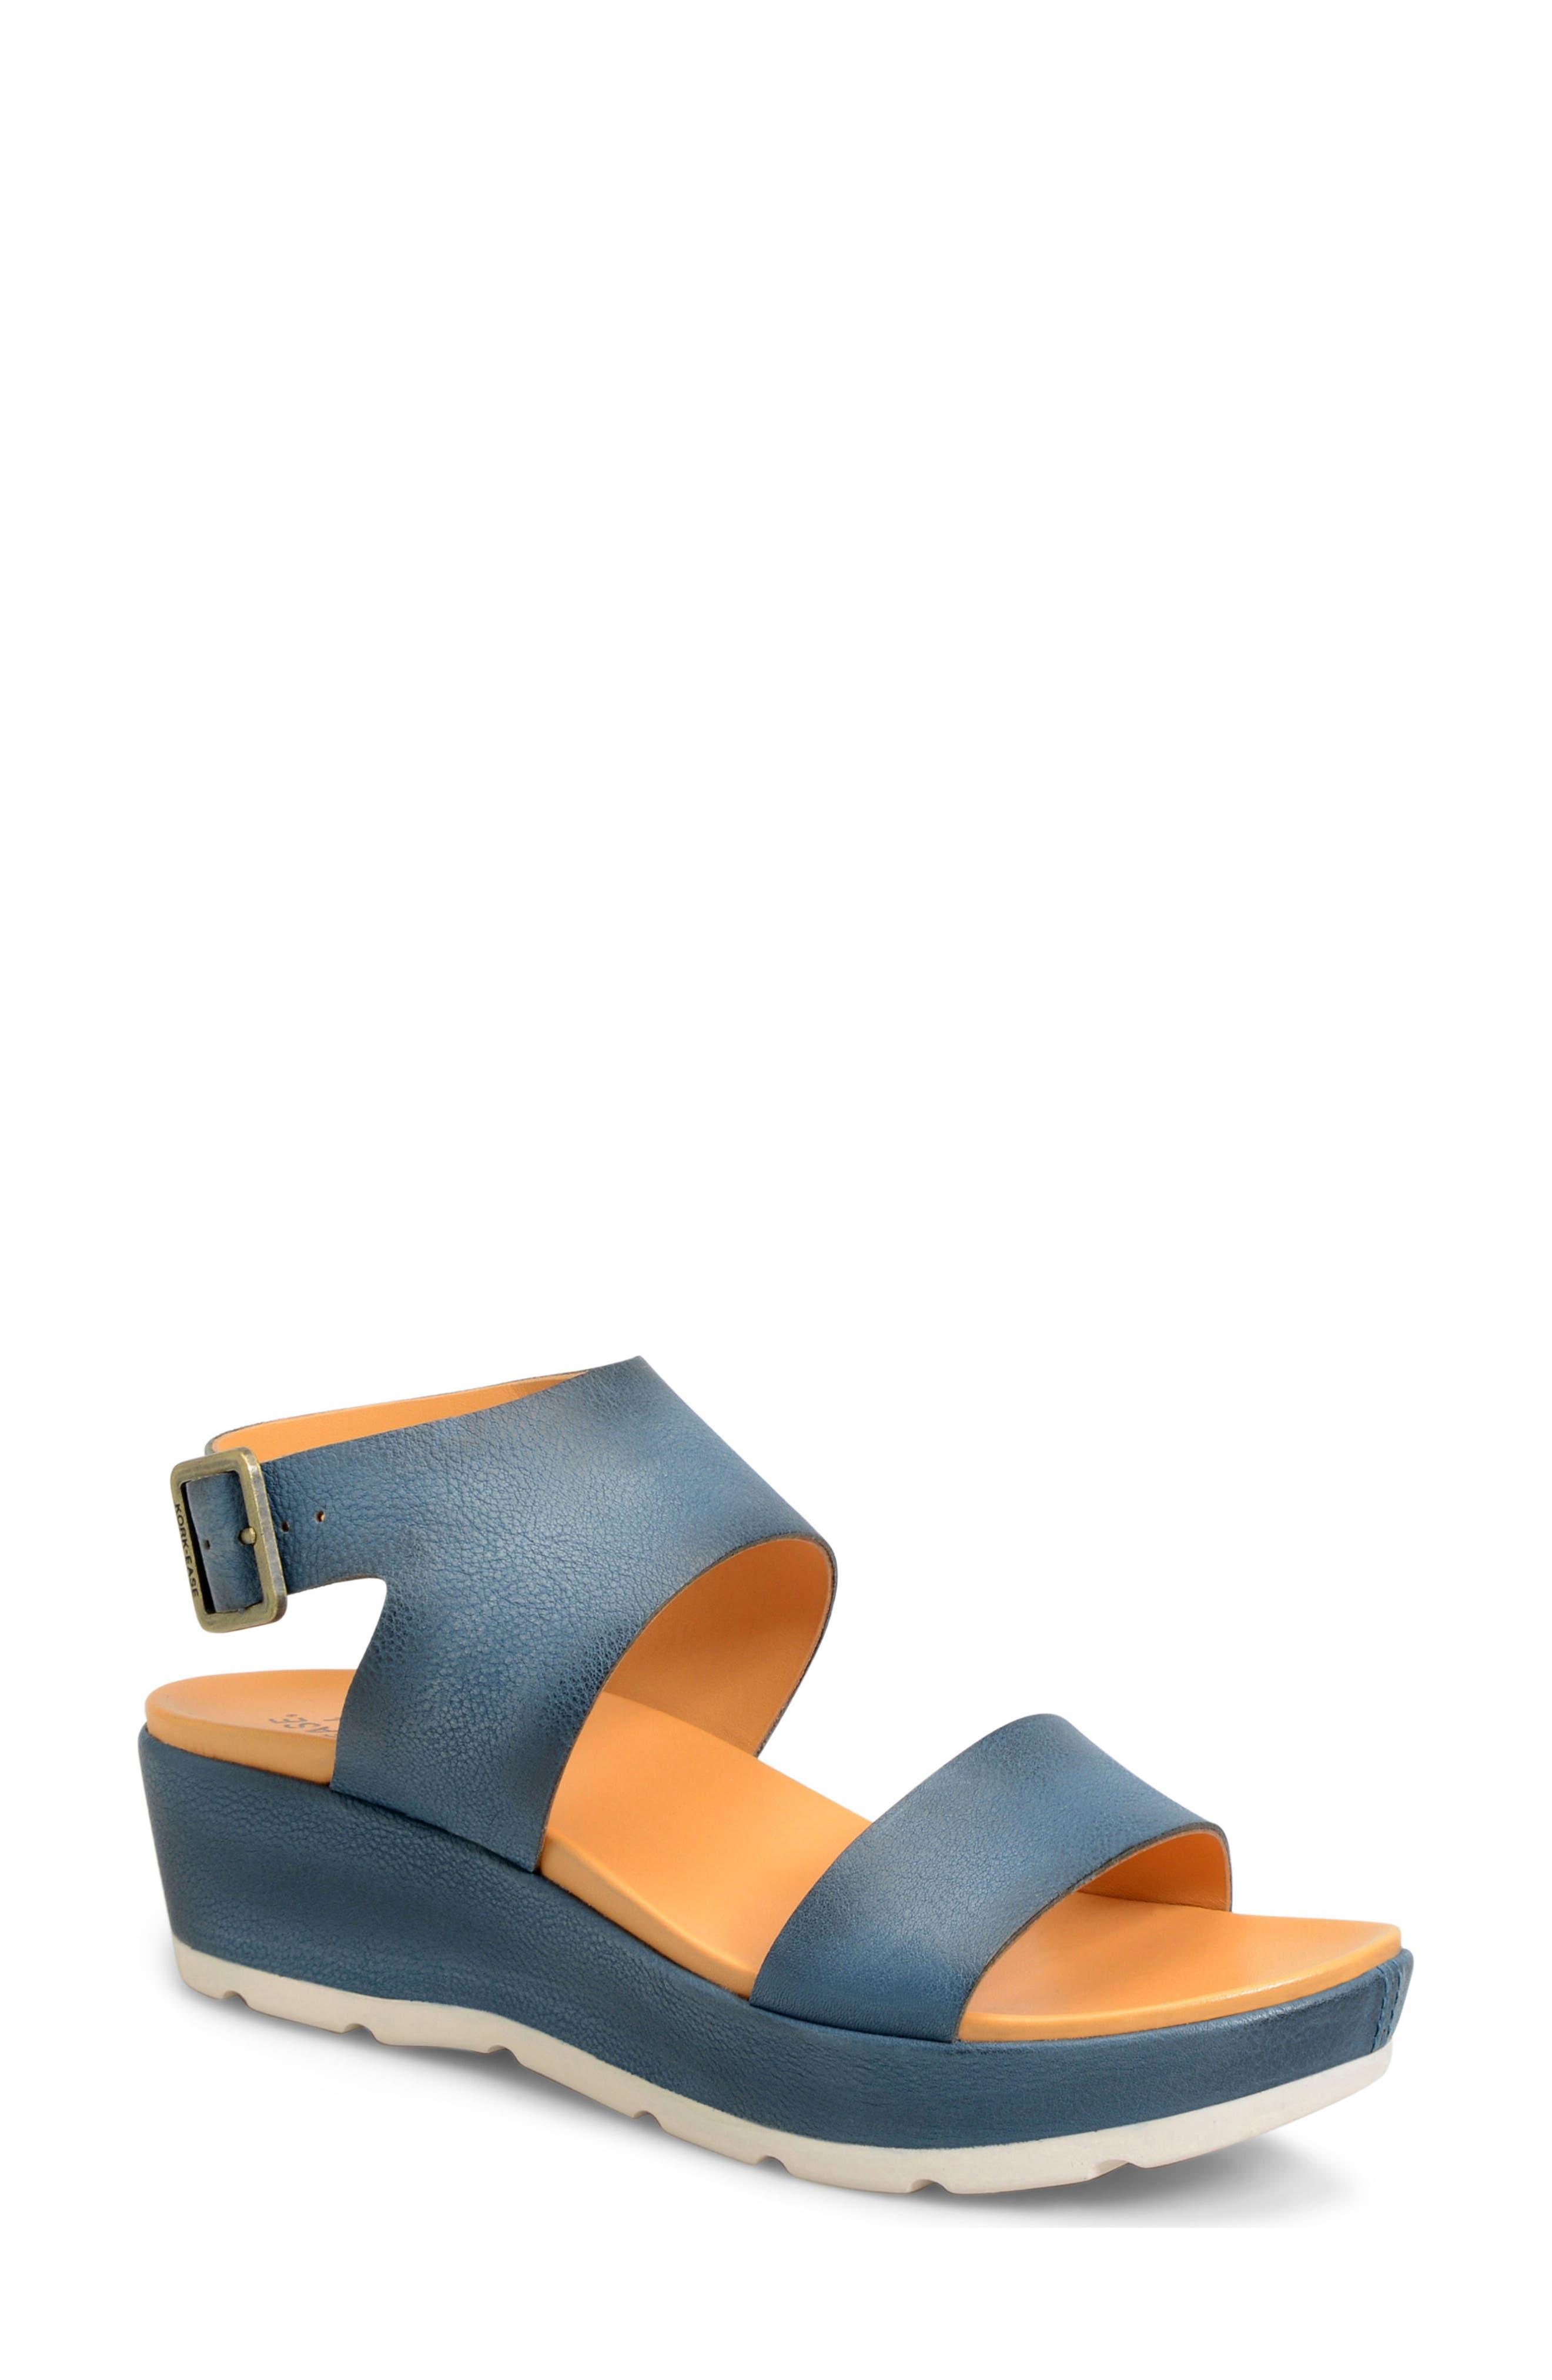 Alternate Image 1 Selected - Kork-Ease® 'Khloe' Platform Wedge Sandal (Women)